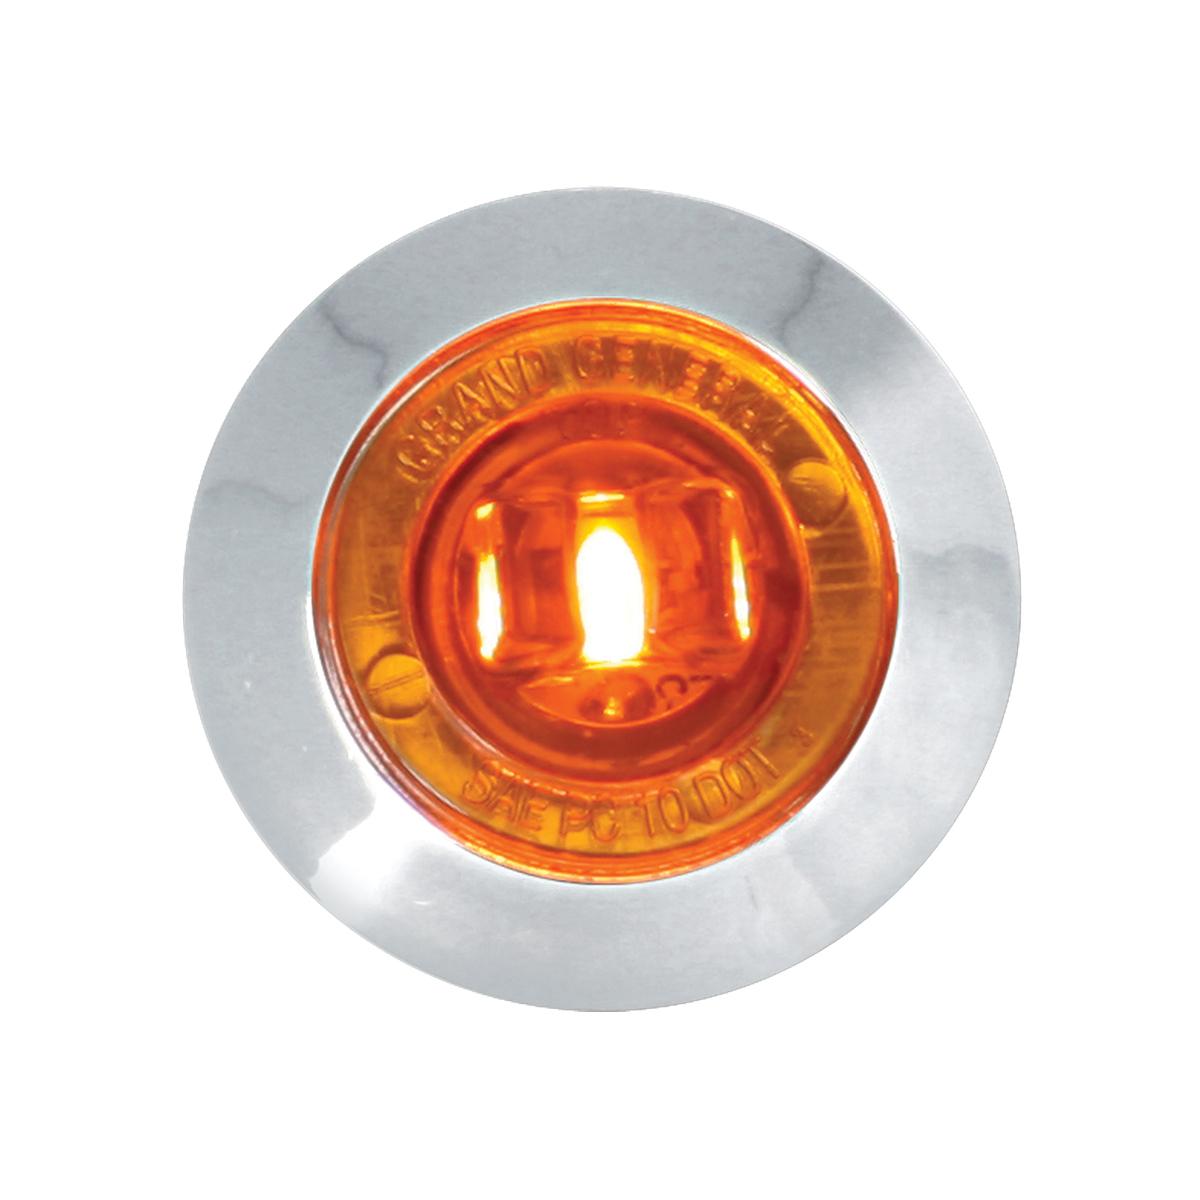 "87060 Amber/Amber 1"" Dia. Mini Push/Screw-in Wide Angle LED Marker Light w/ Chrome Bezel"